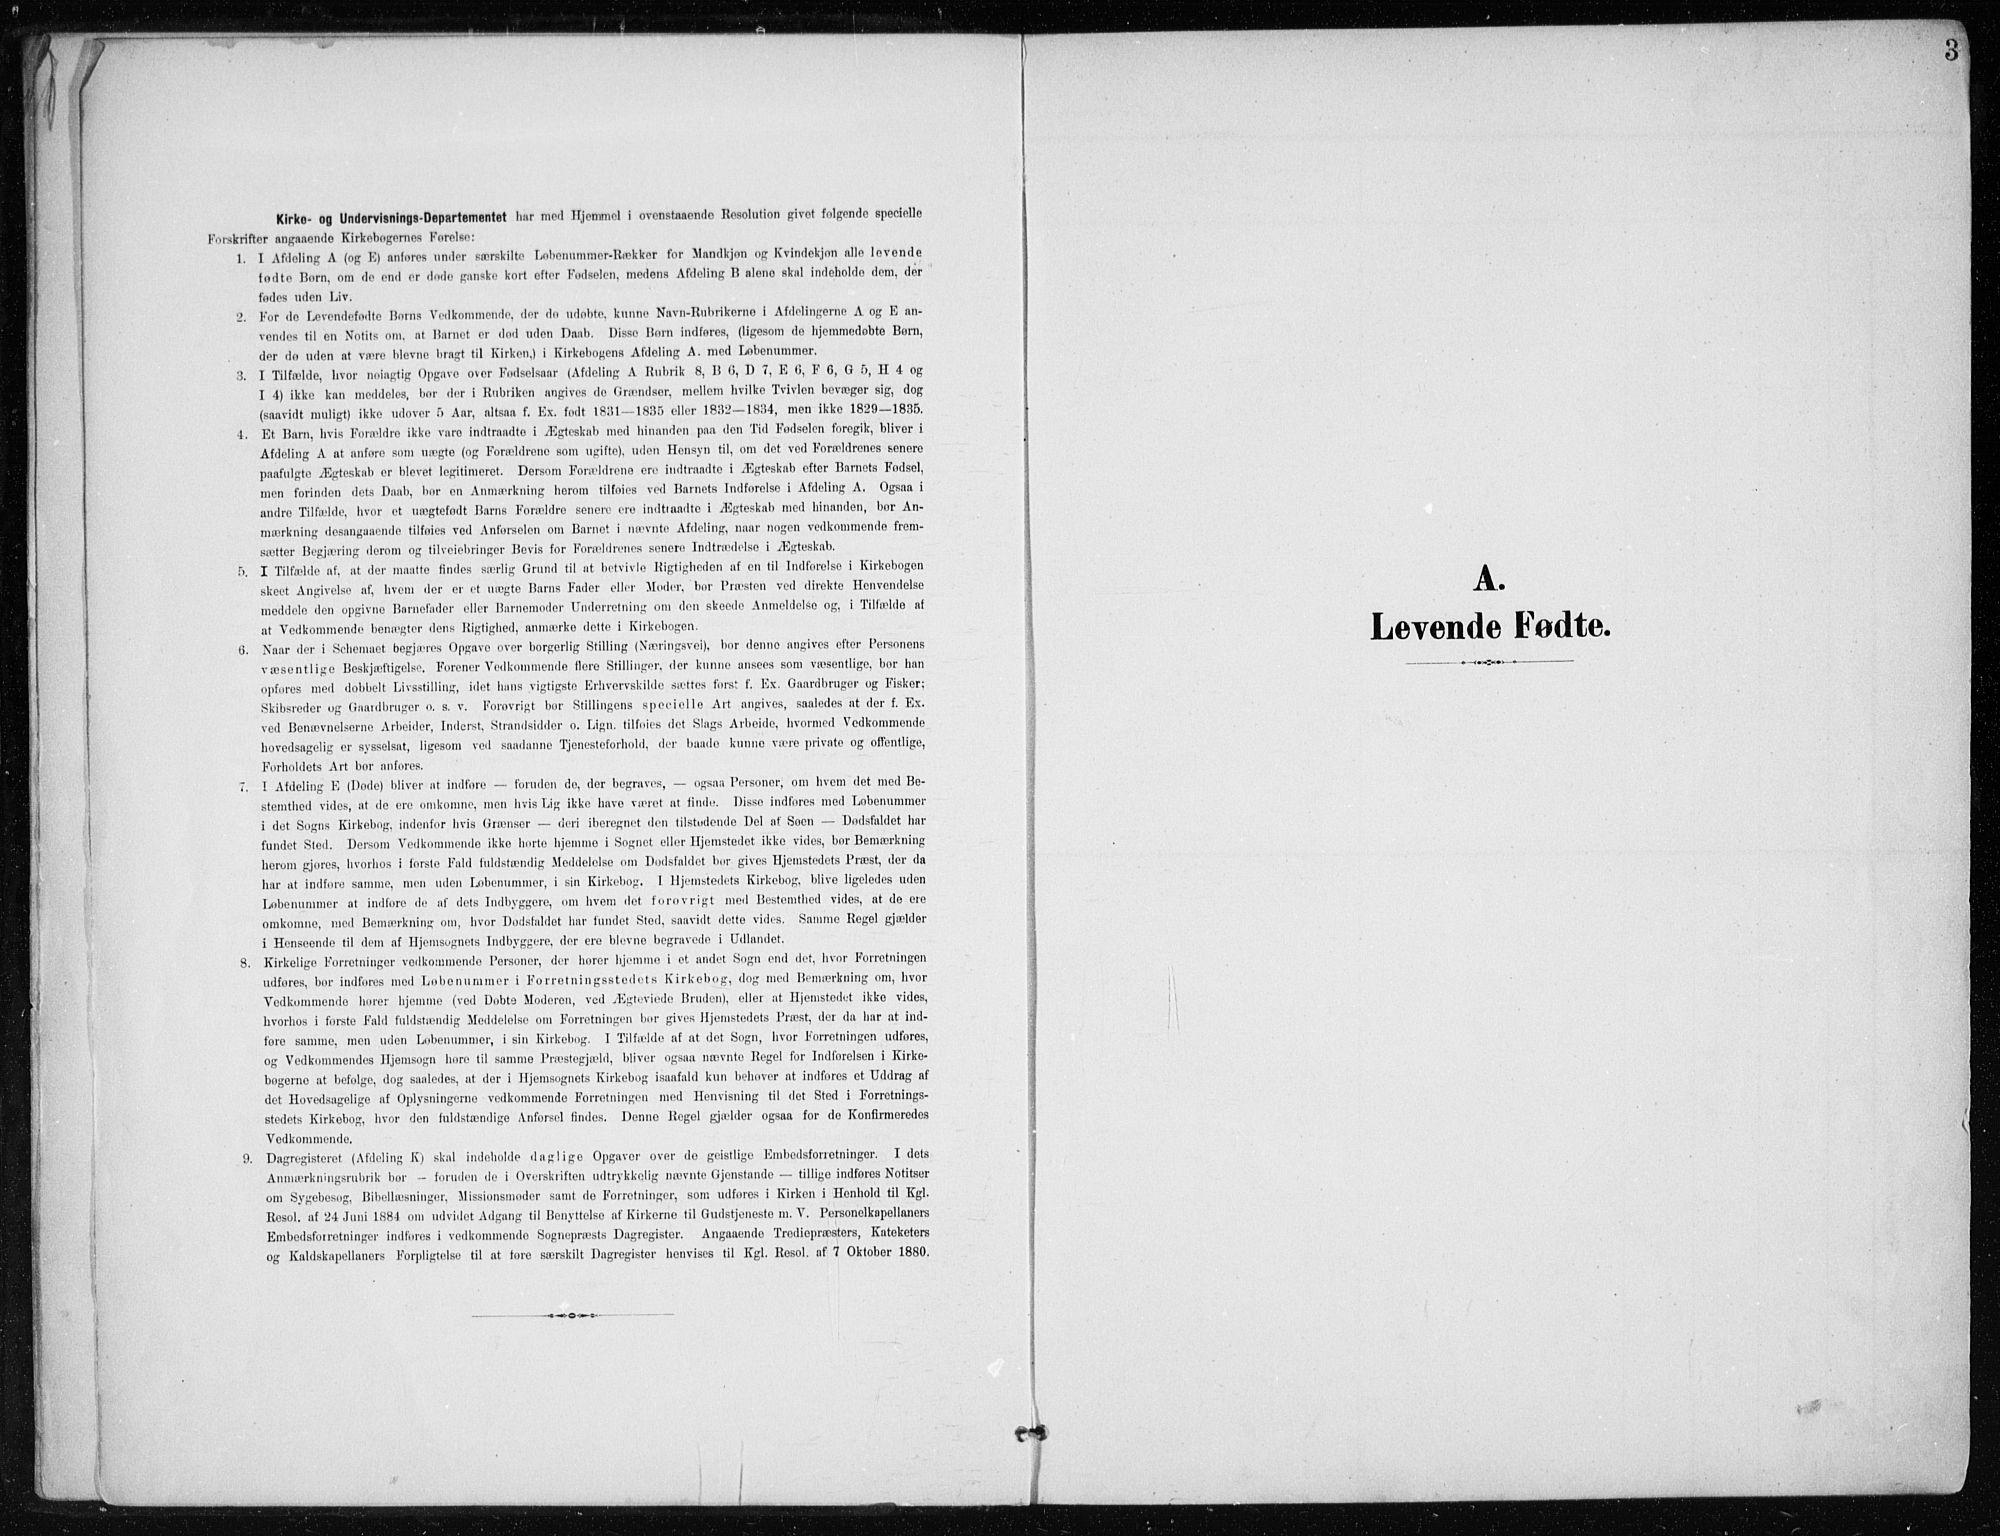 SAT, Ministerialprotokoller, klokkerbøker og fødselsregistre - Nordland, 866/L0941: Ministerialbok nr. 866A04, 1901-1917, s. 3